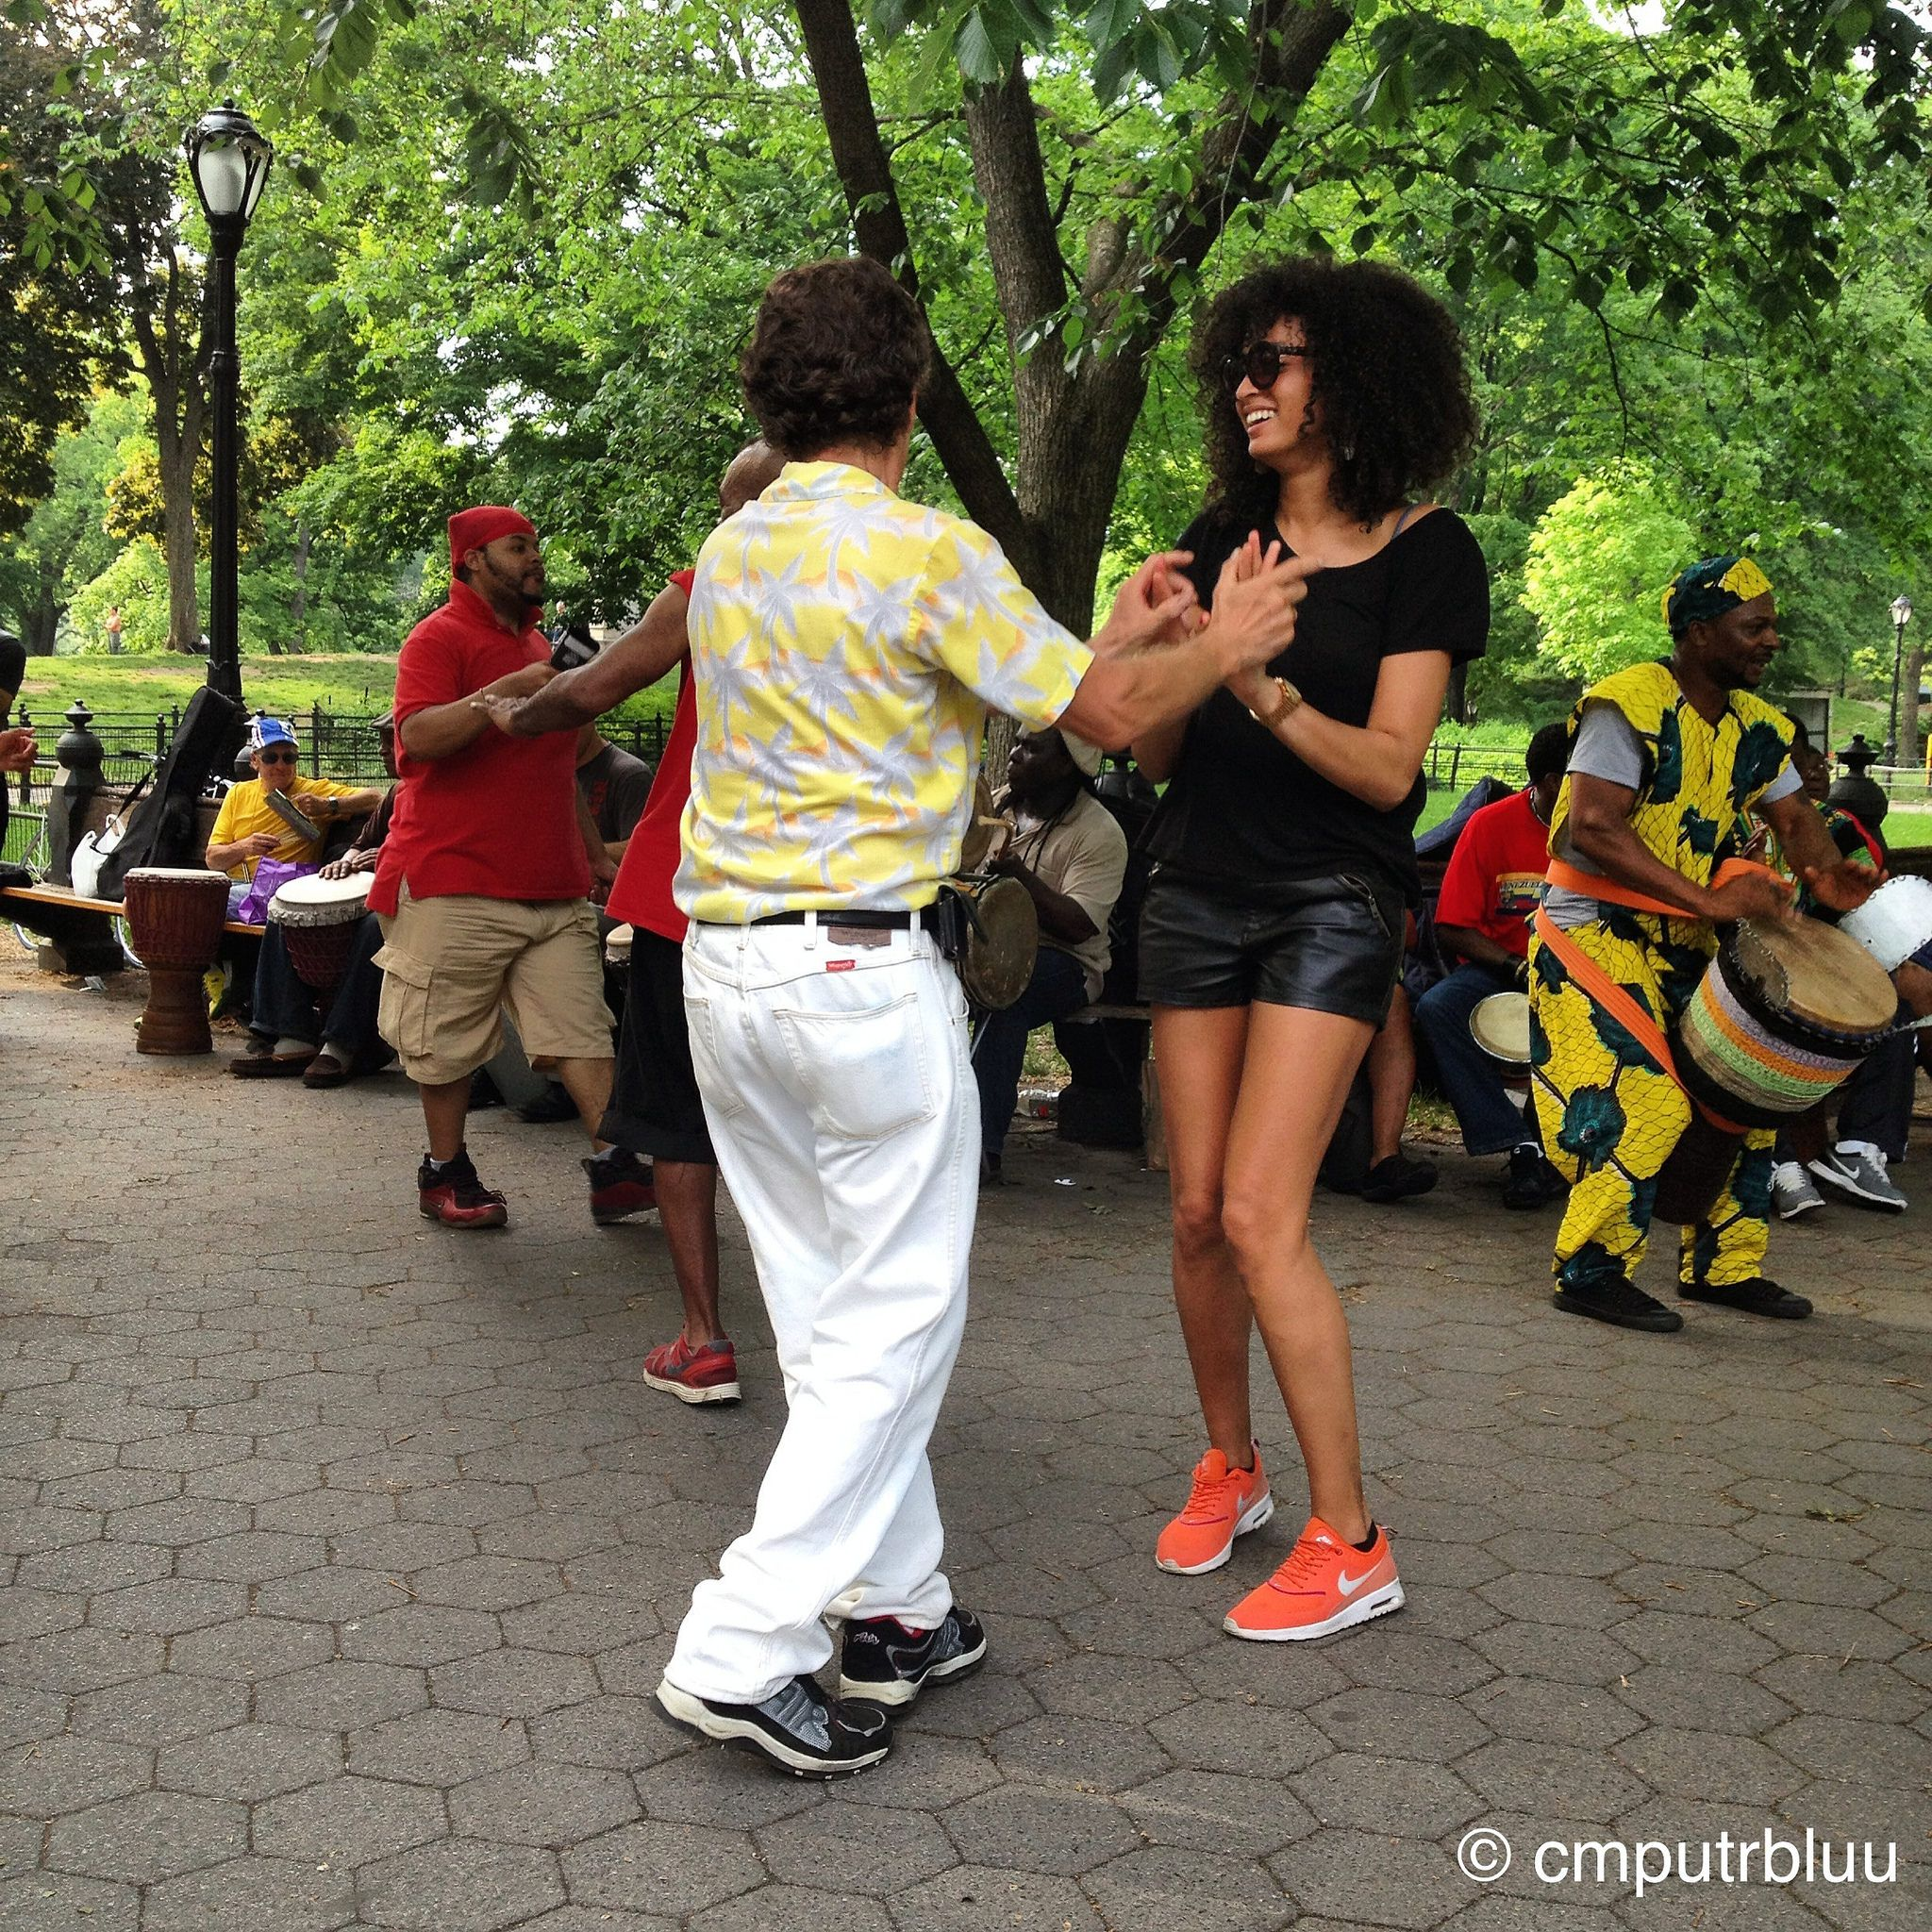 Sunday Fun | Central Park | https://flic.kr/p/vCg5eK